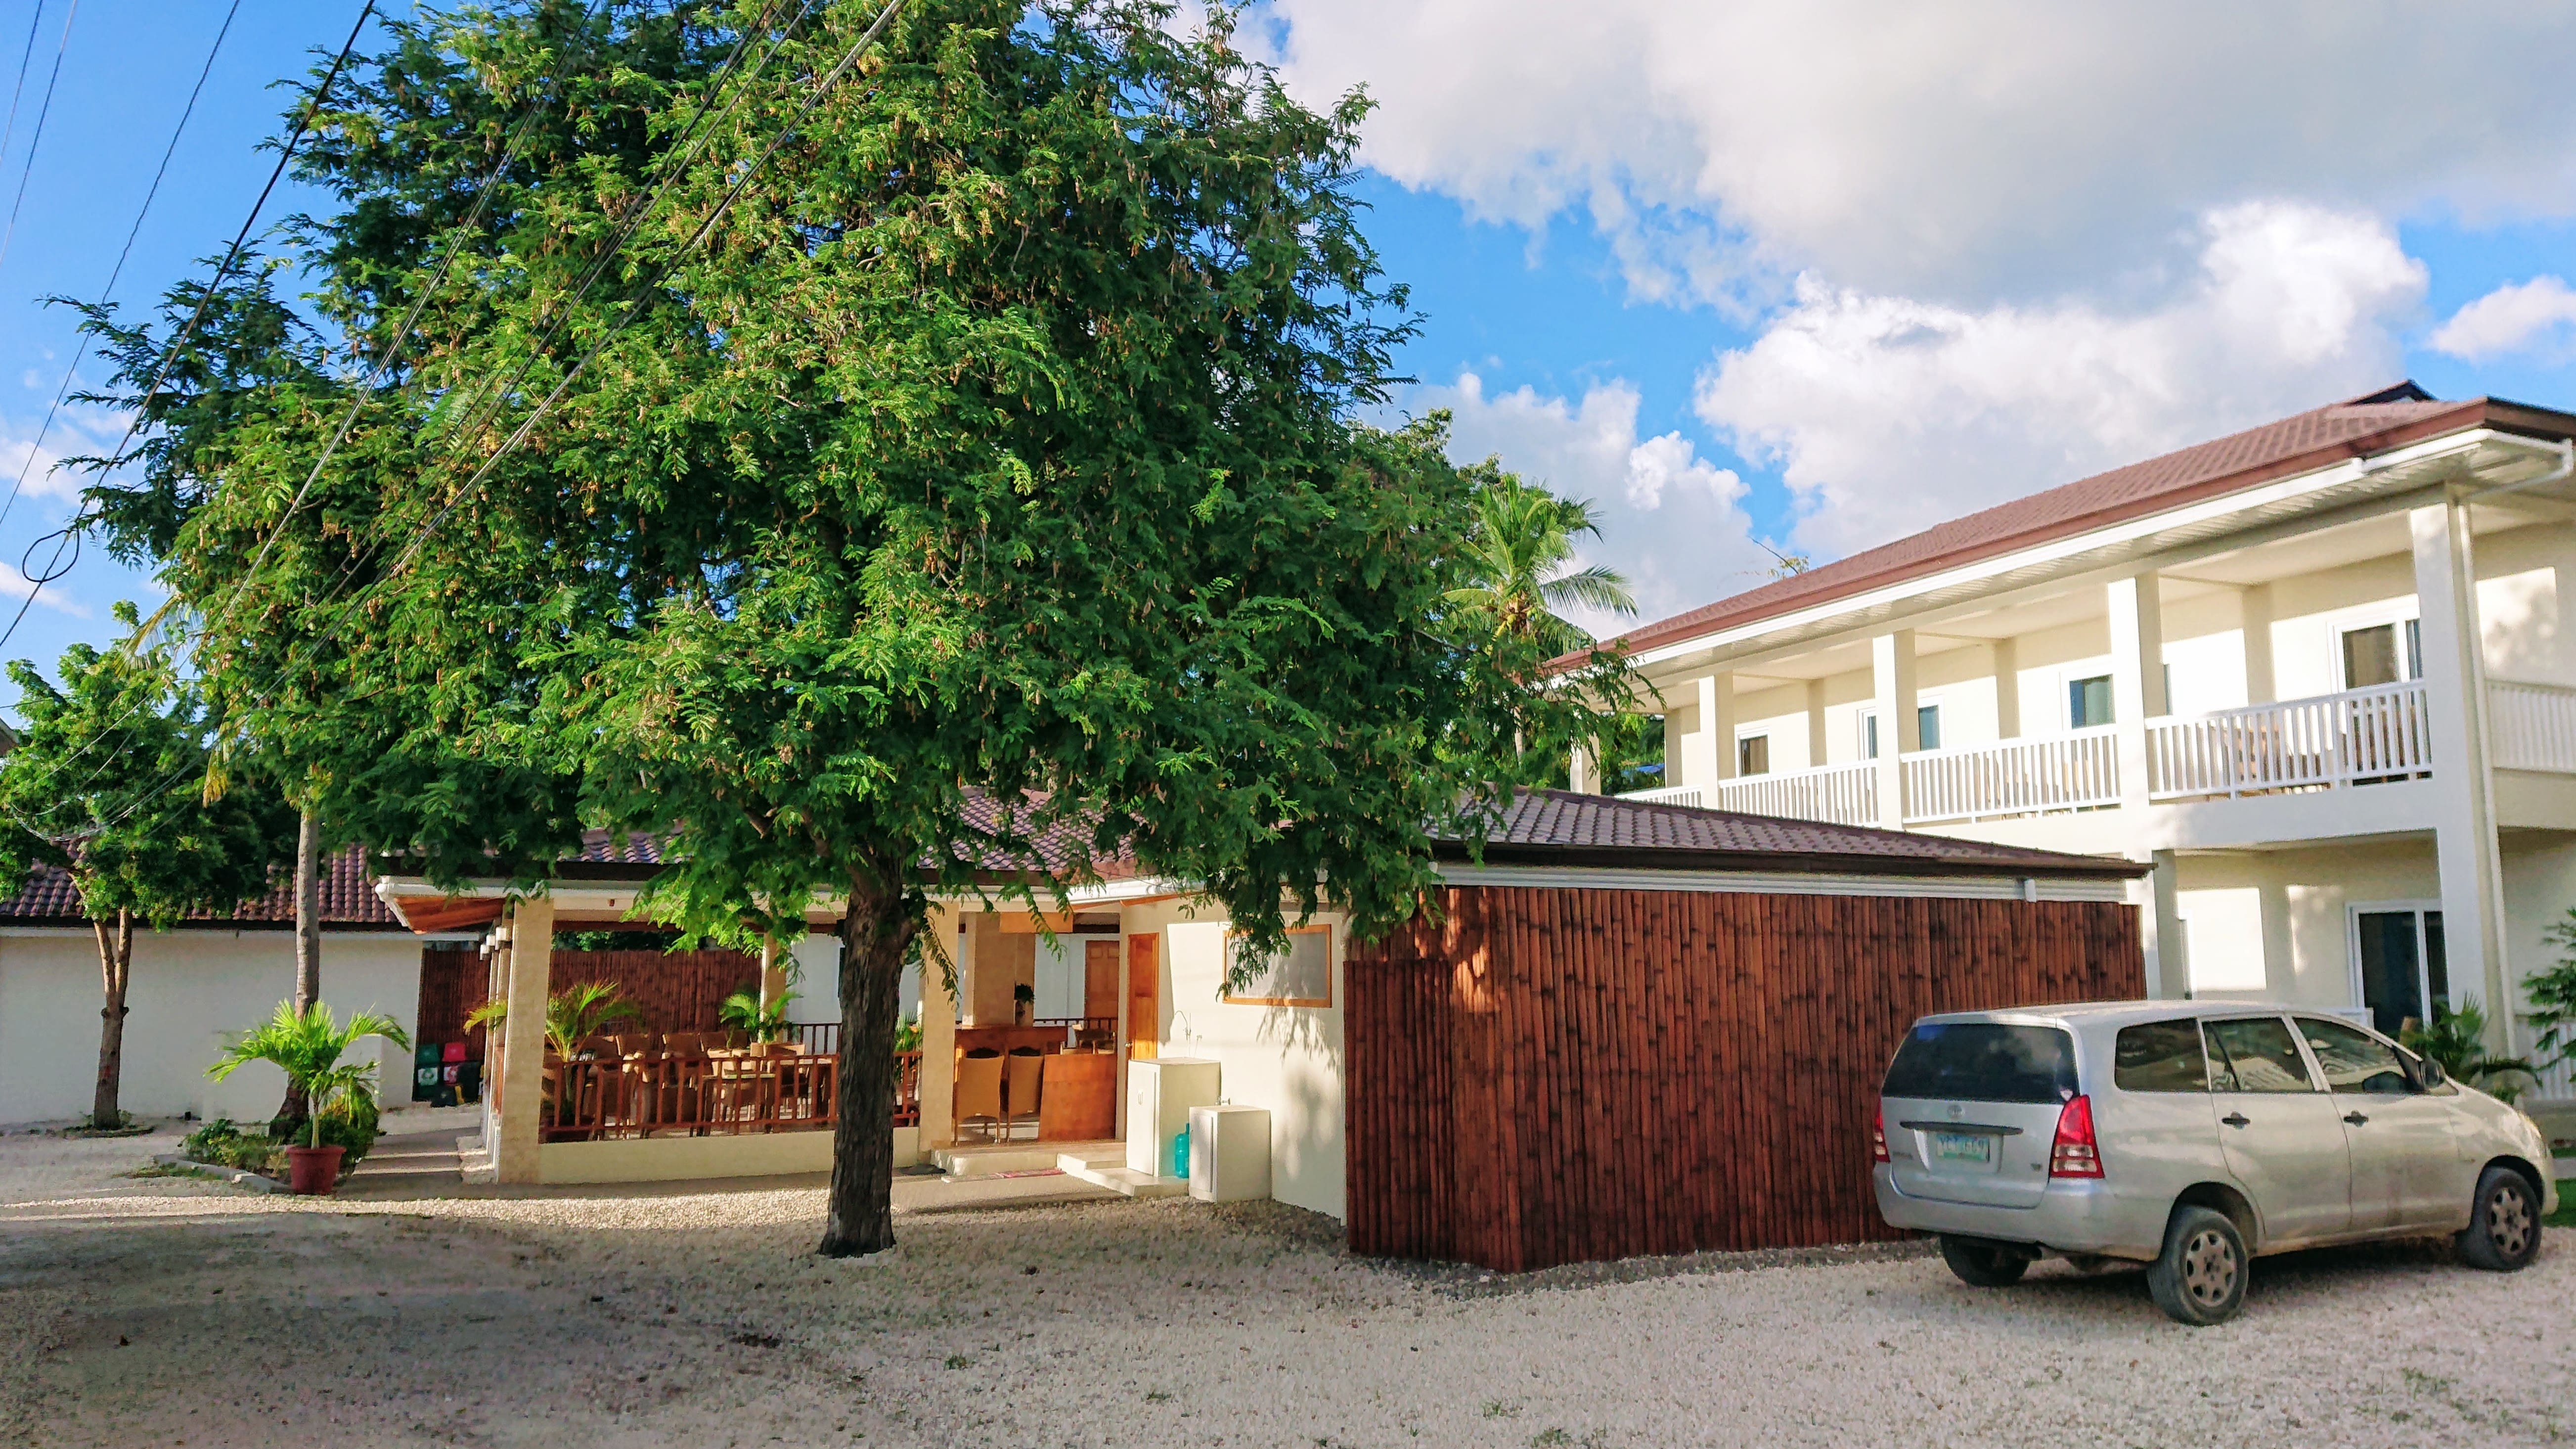 Entrance to Cebu Seaview Dive Resort